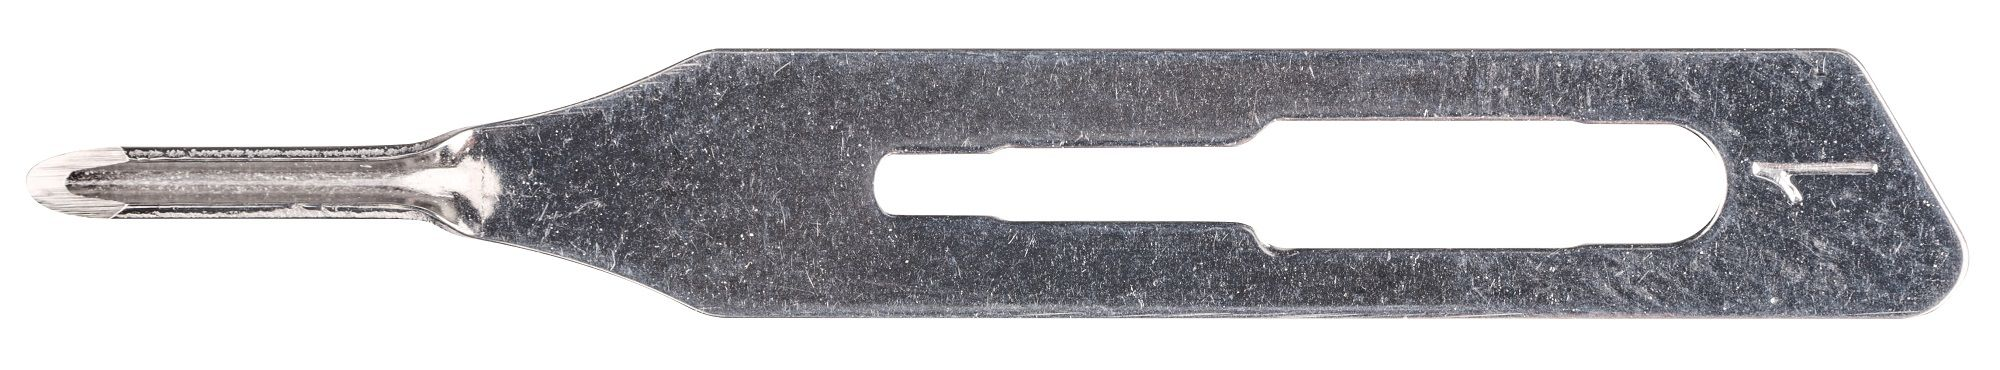 Lâmina de Goiva/Gubia CZ MBI N° 01 (50 Unidades) - Frete Grátis